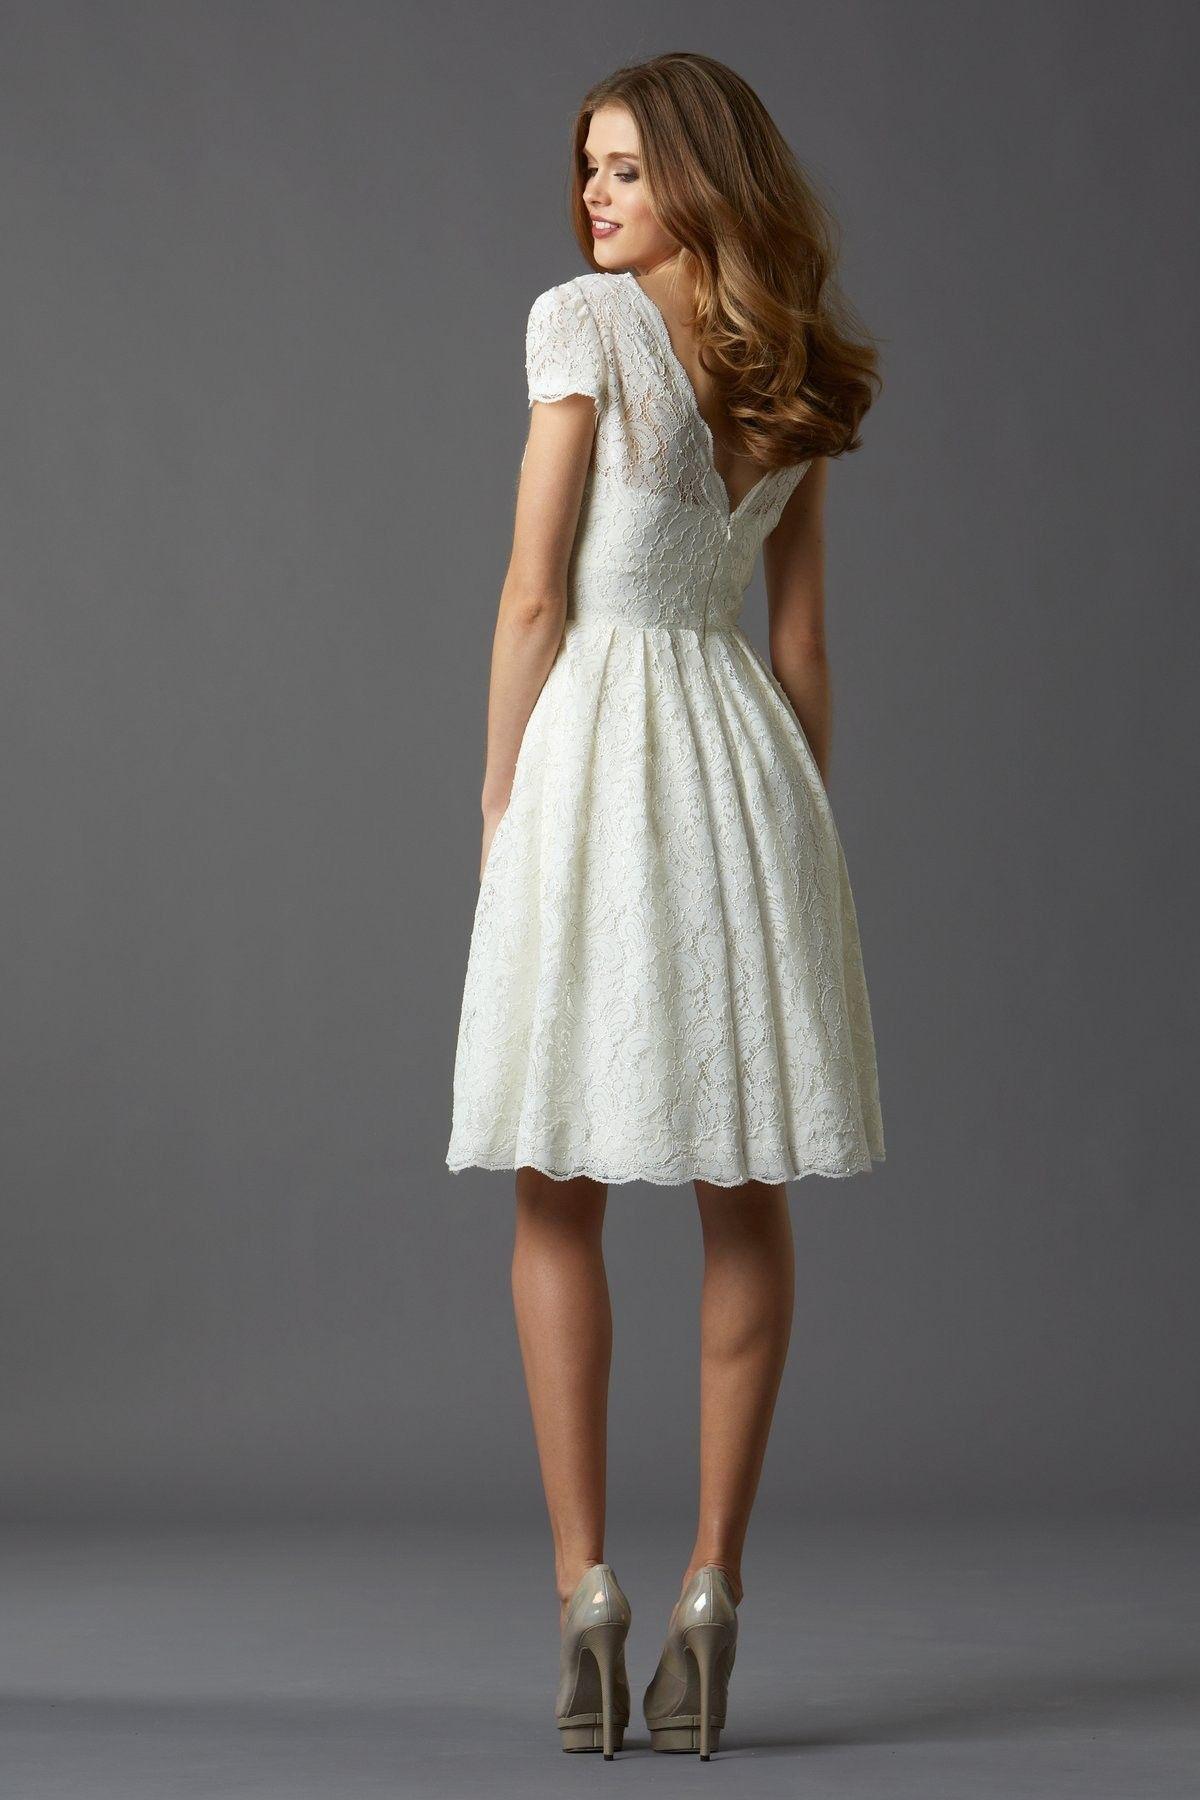 Short Sleeve Tank Top Knee Length Lace A Line Wedding Dress ...